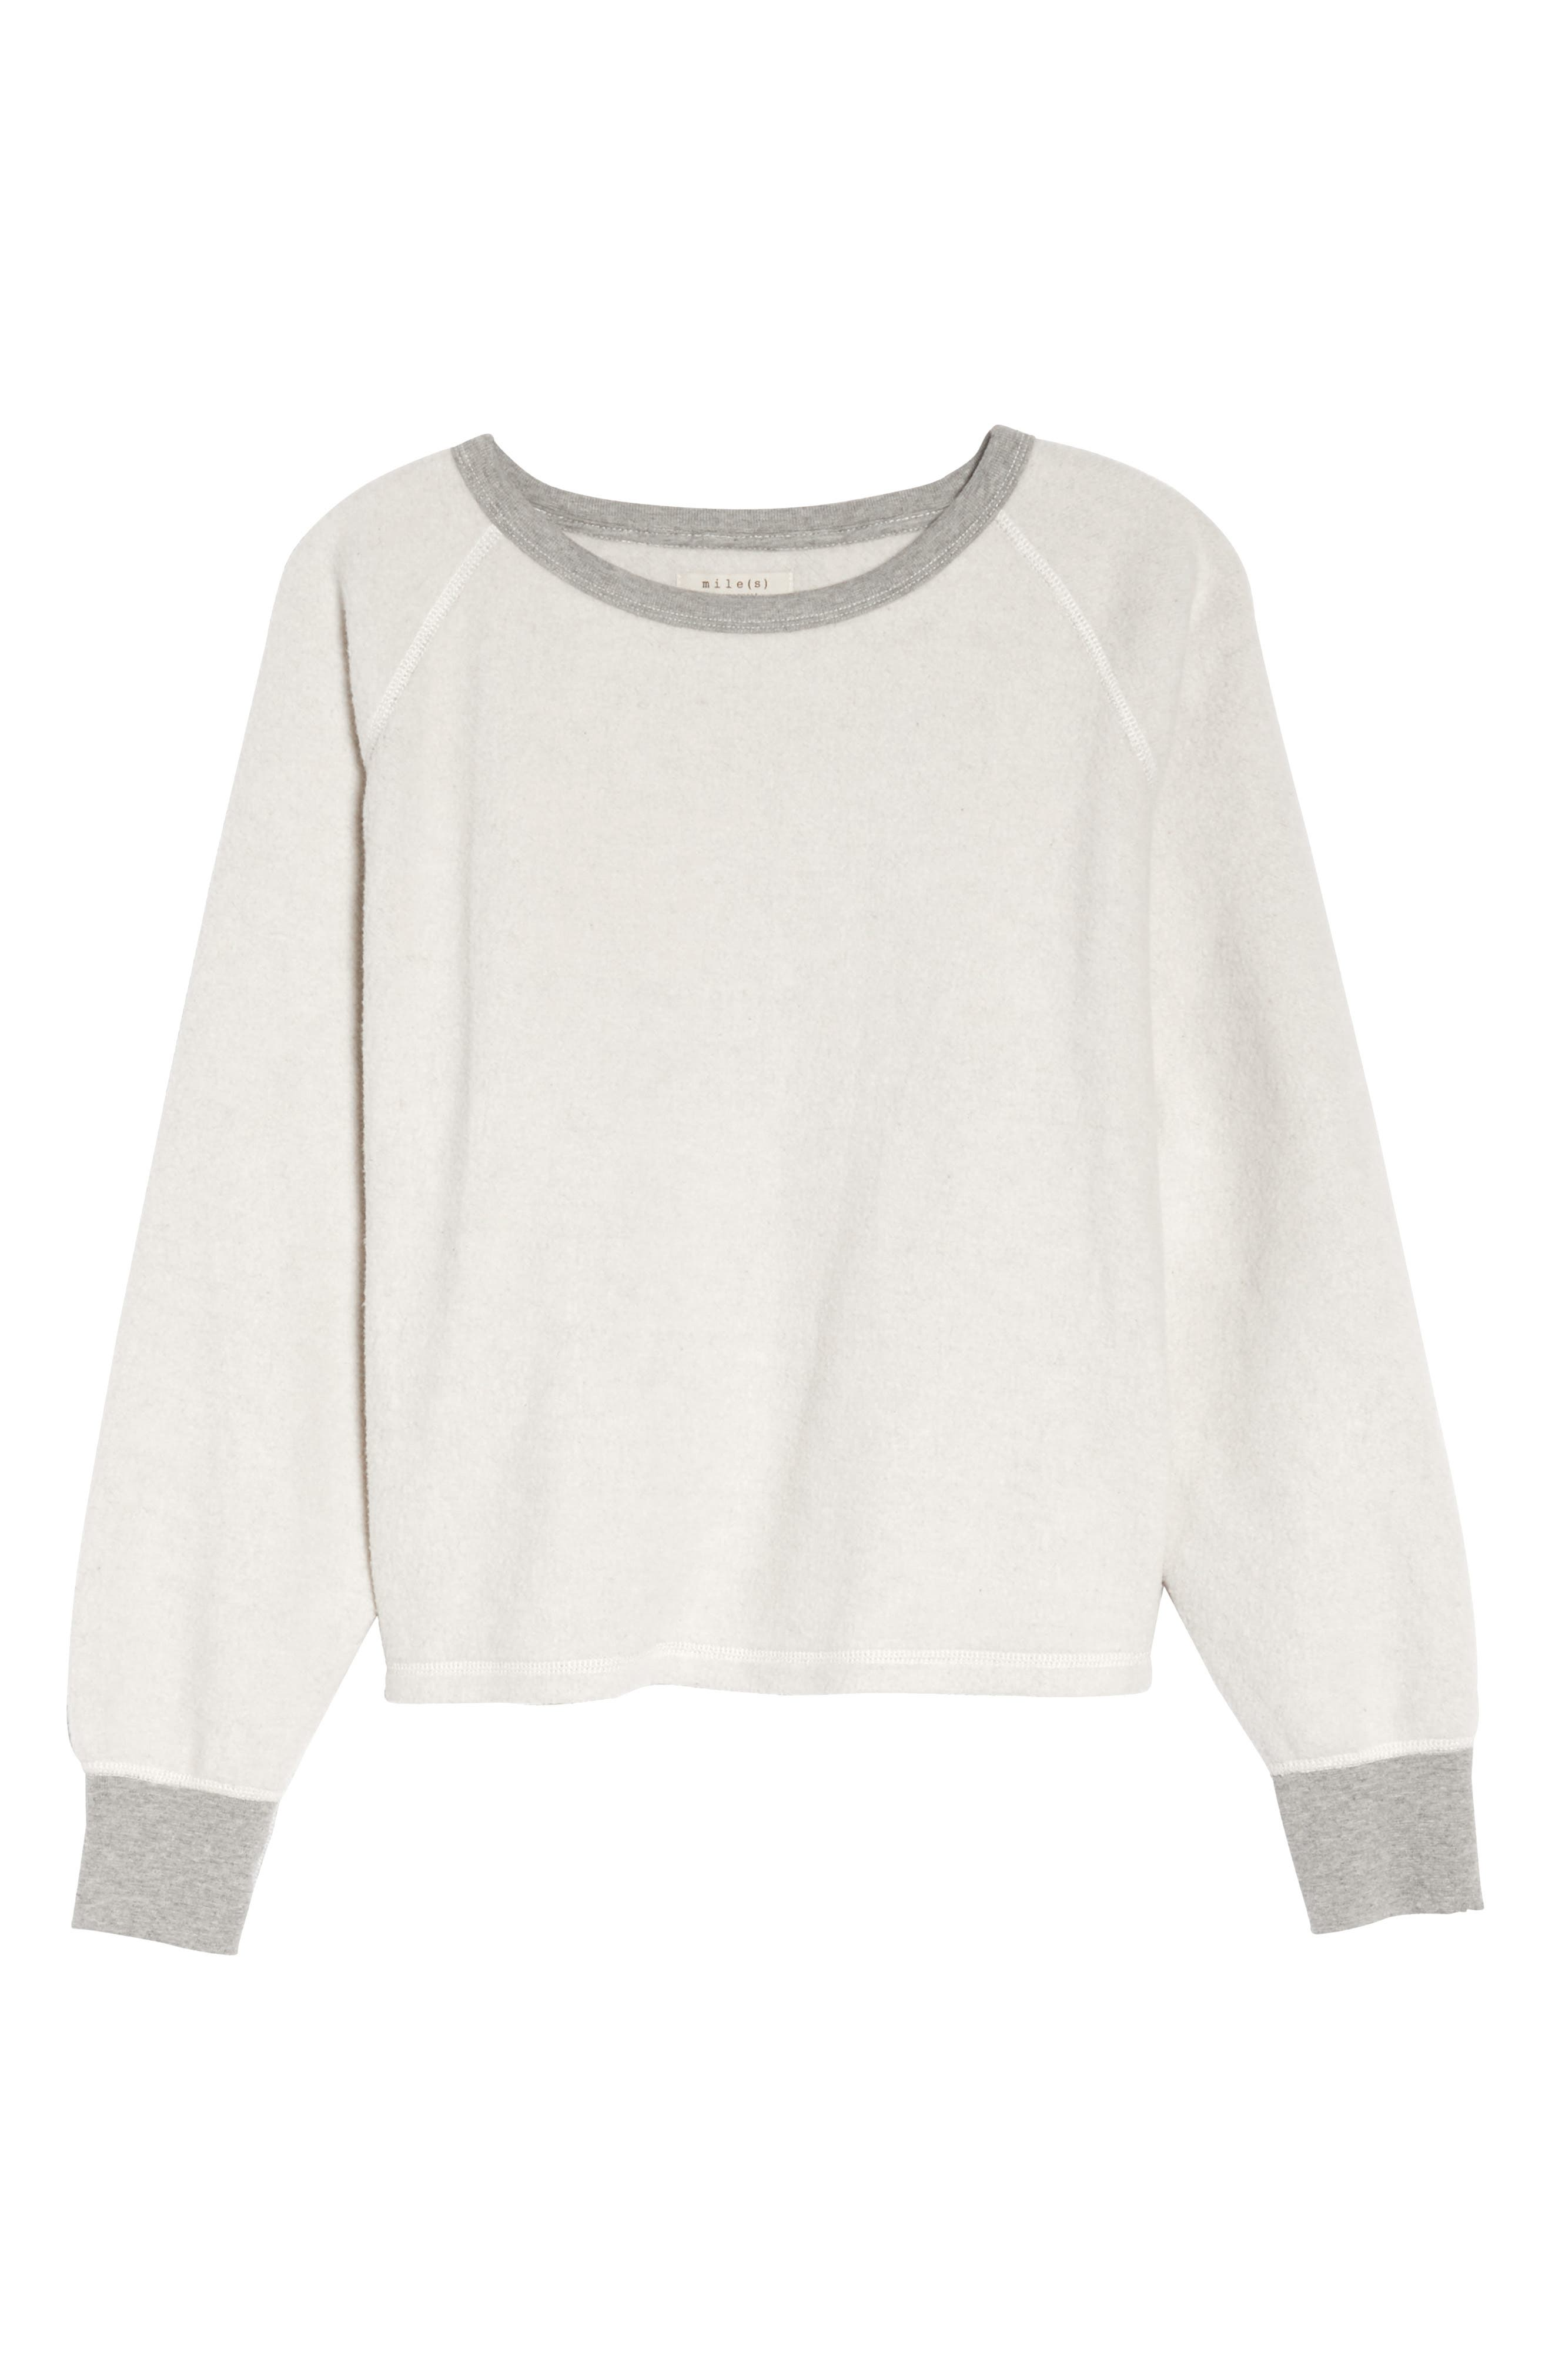 MADEWELL, Fleece Pajama Sweatshirt, Alternate thumbnail 6, color, 020